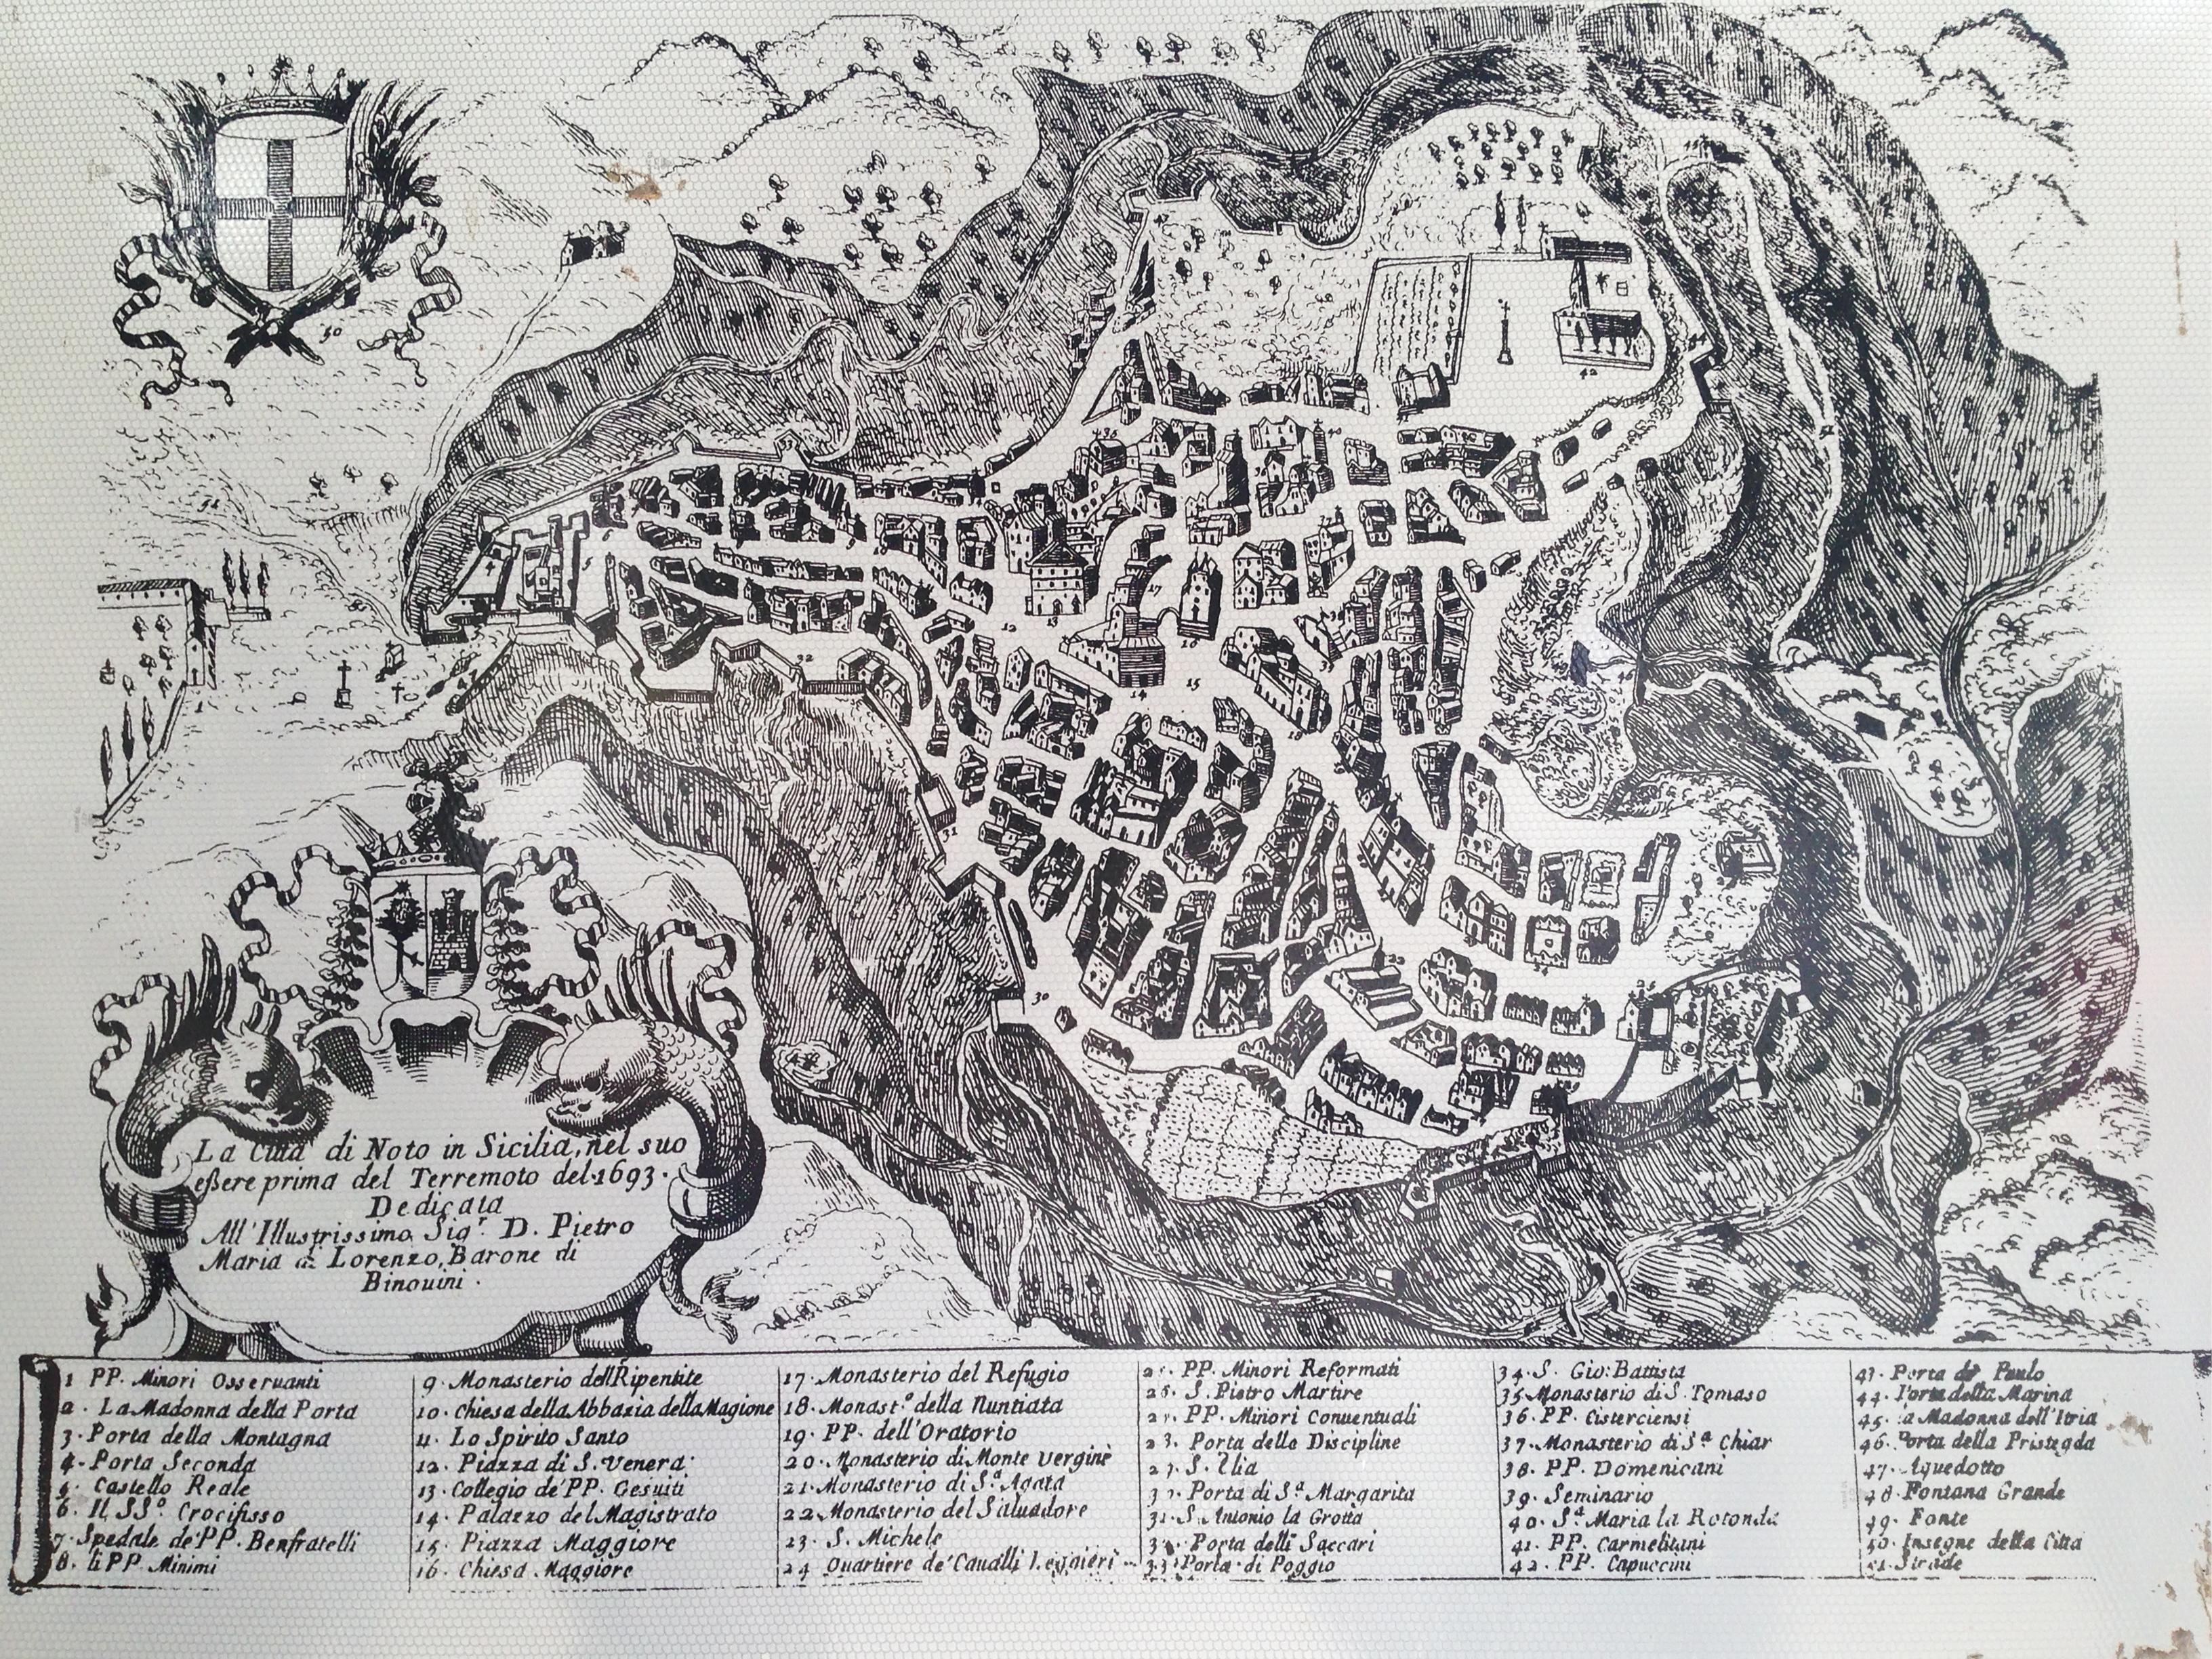 Mappa_di_Noto_Antica3